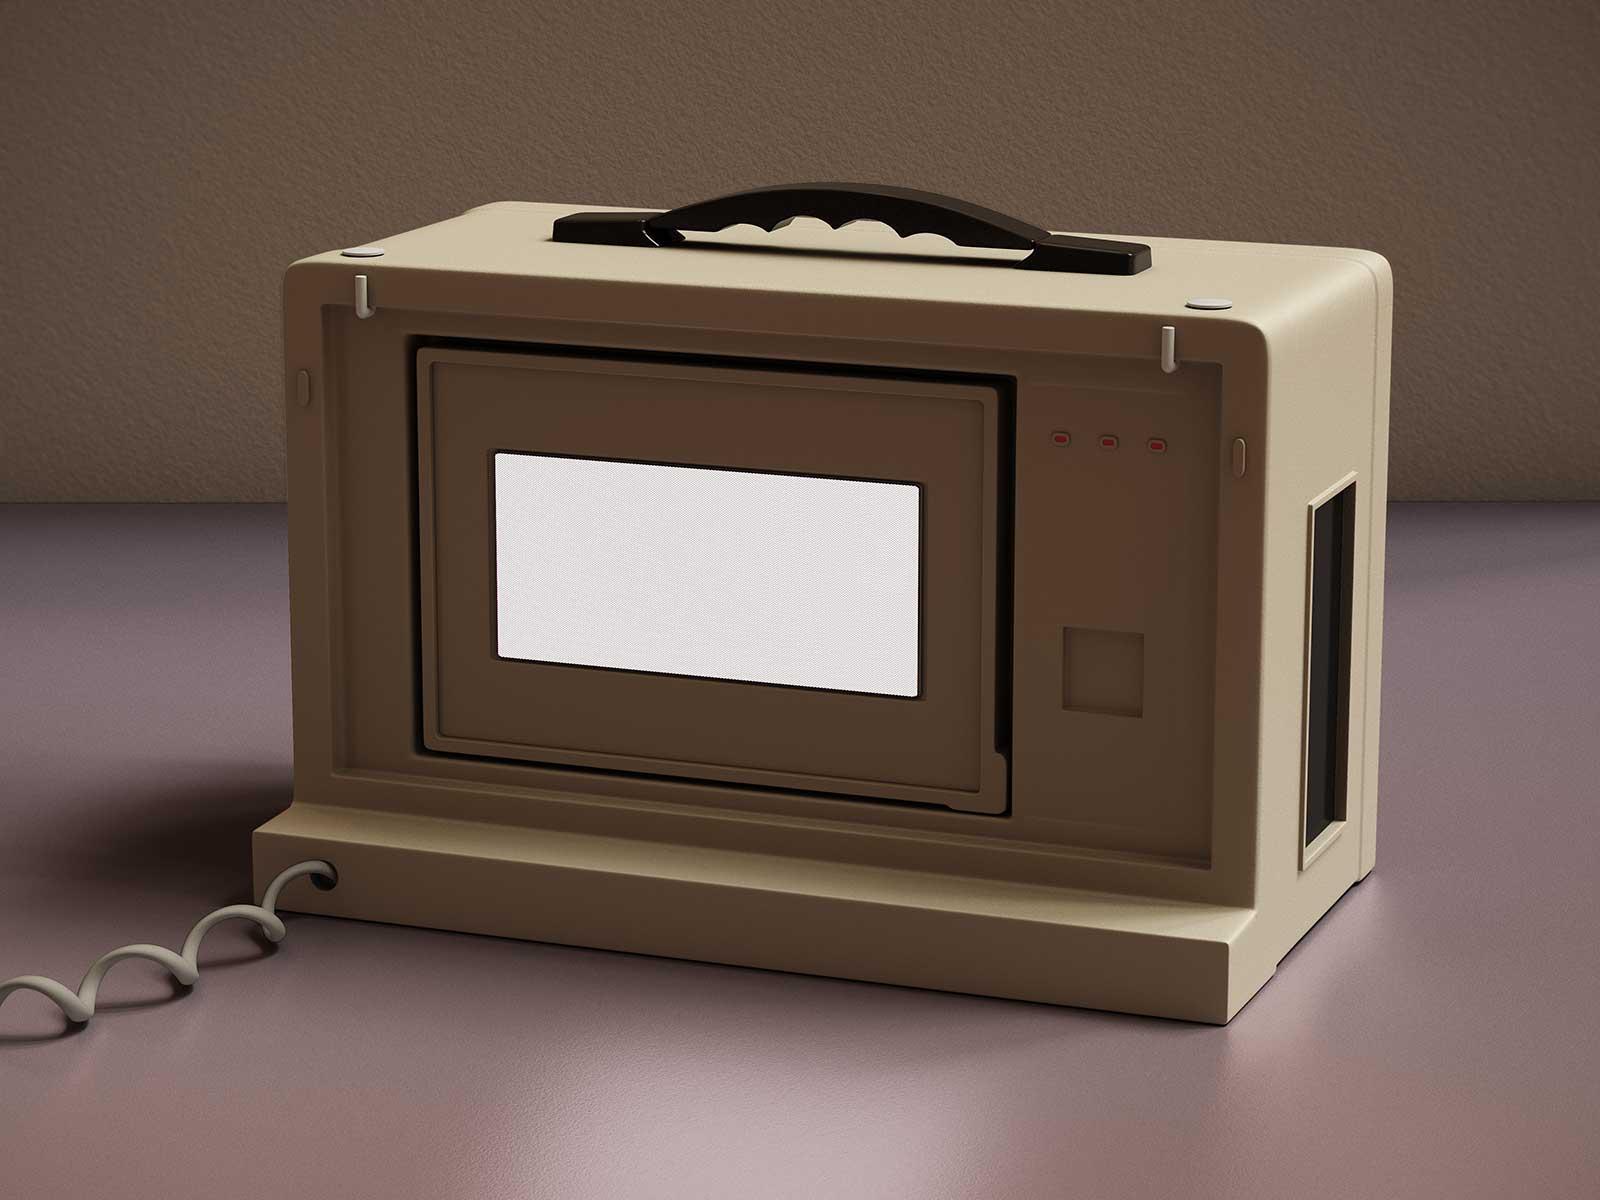 Monitor I 09, CGI Fine Art Print, 39 x 52 cm, 2013